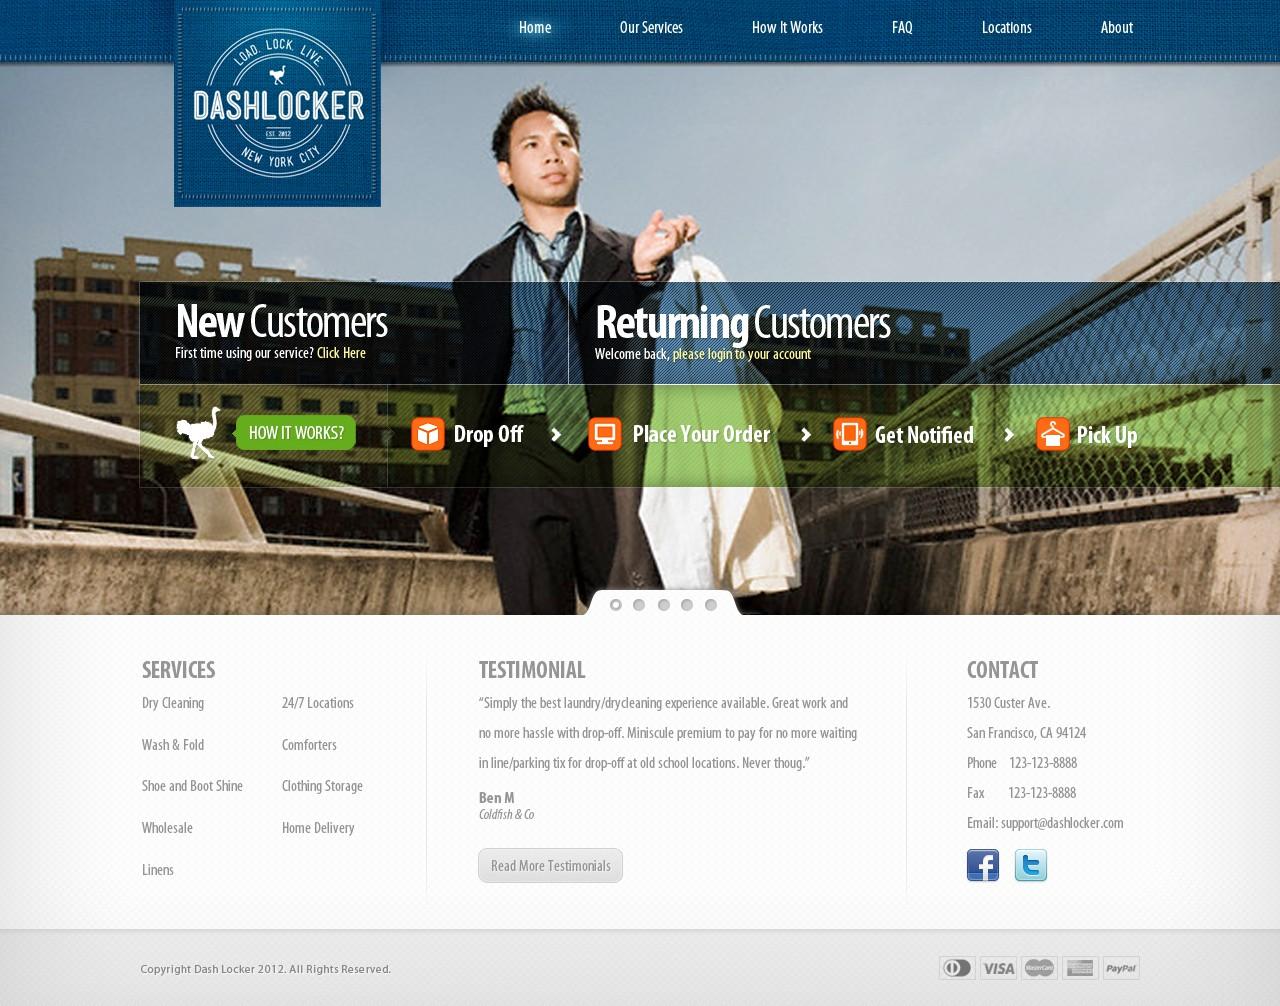 Help DashLocker with a new website design